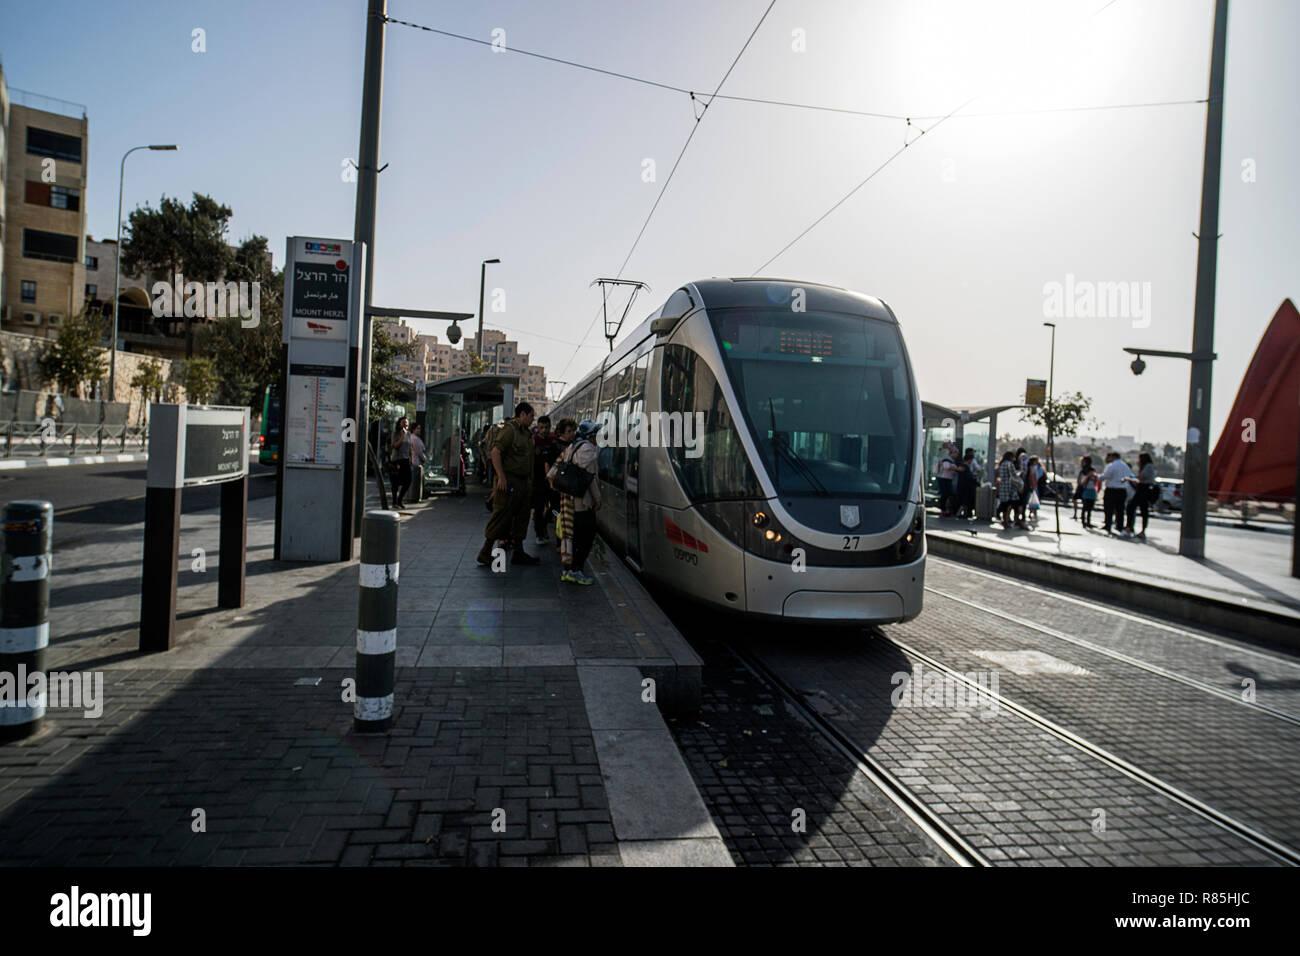 Jerusalem Light Rail tram train on Jaffa road. JERUSALEM, ISRAEL. 24 October 2018. - Stock Image